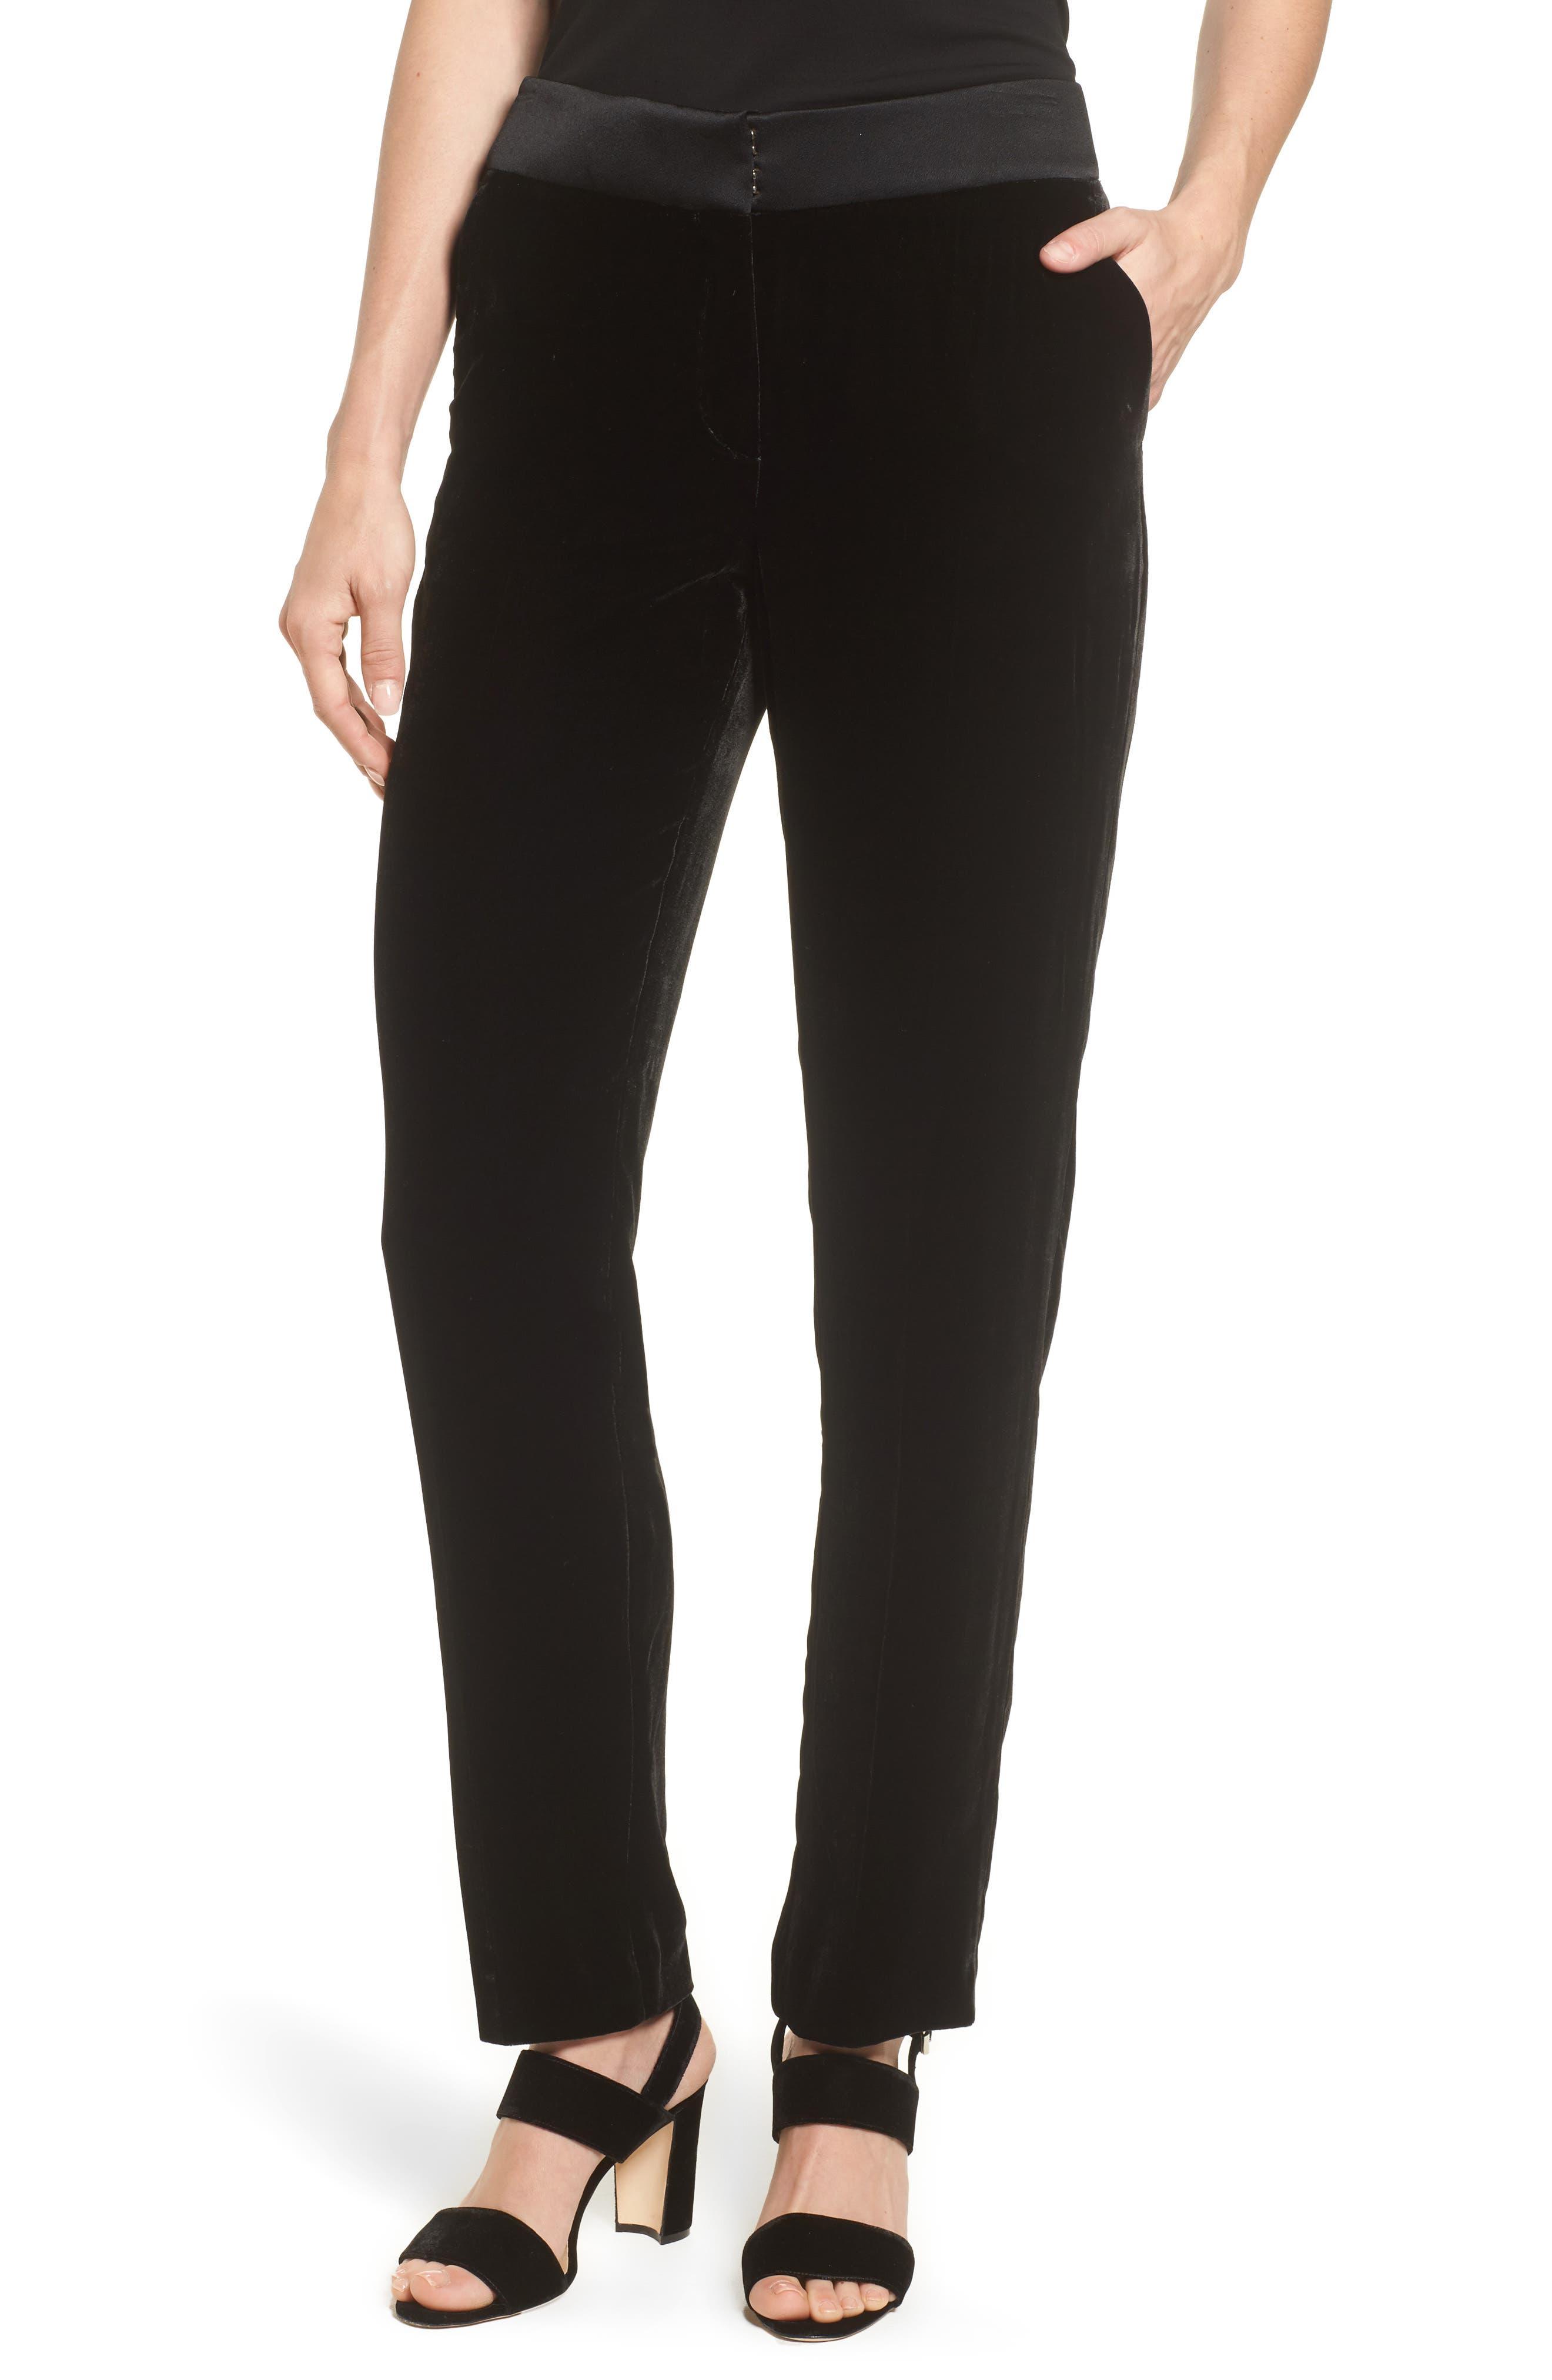 Tolesa Straight Leg Velvet Pants,                             Main thumbnail 1, color,                             Black